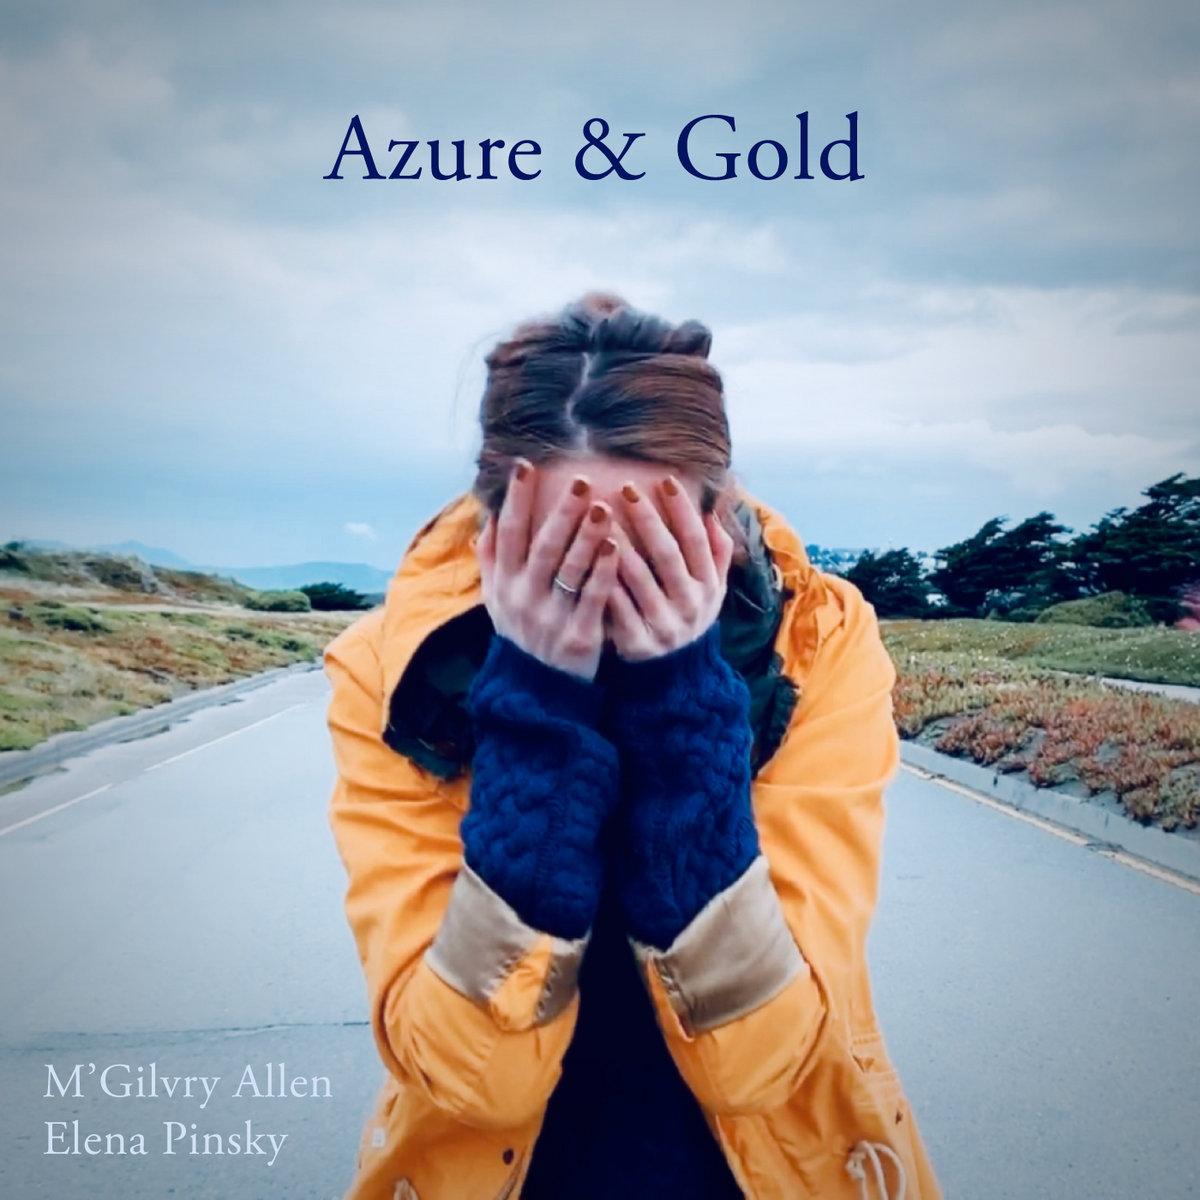 Azure & Gold (feat. Elena Pinsky) by M'Gilvry Allen